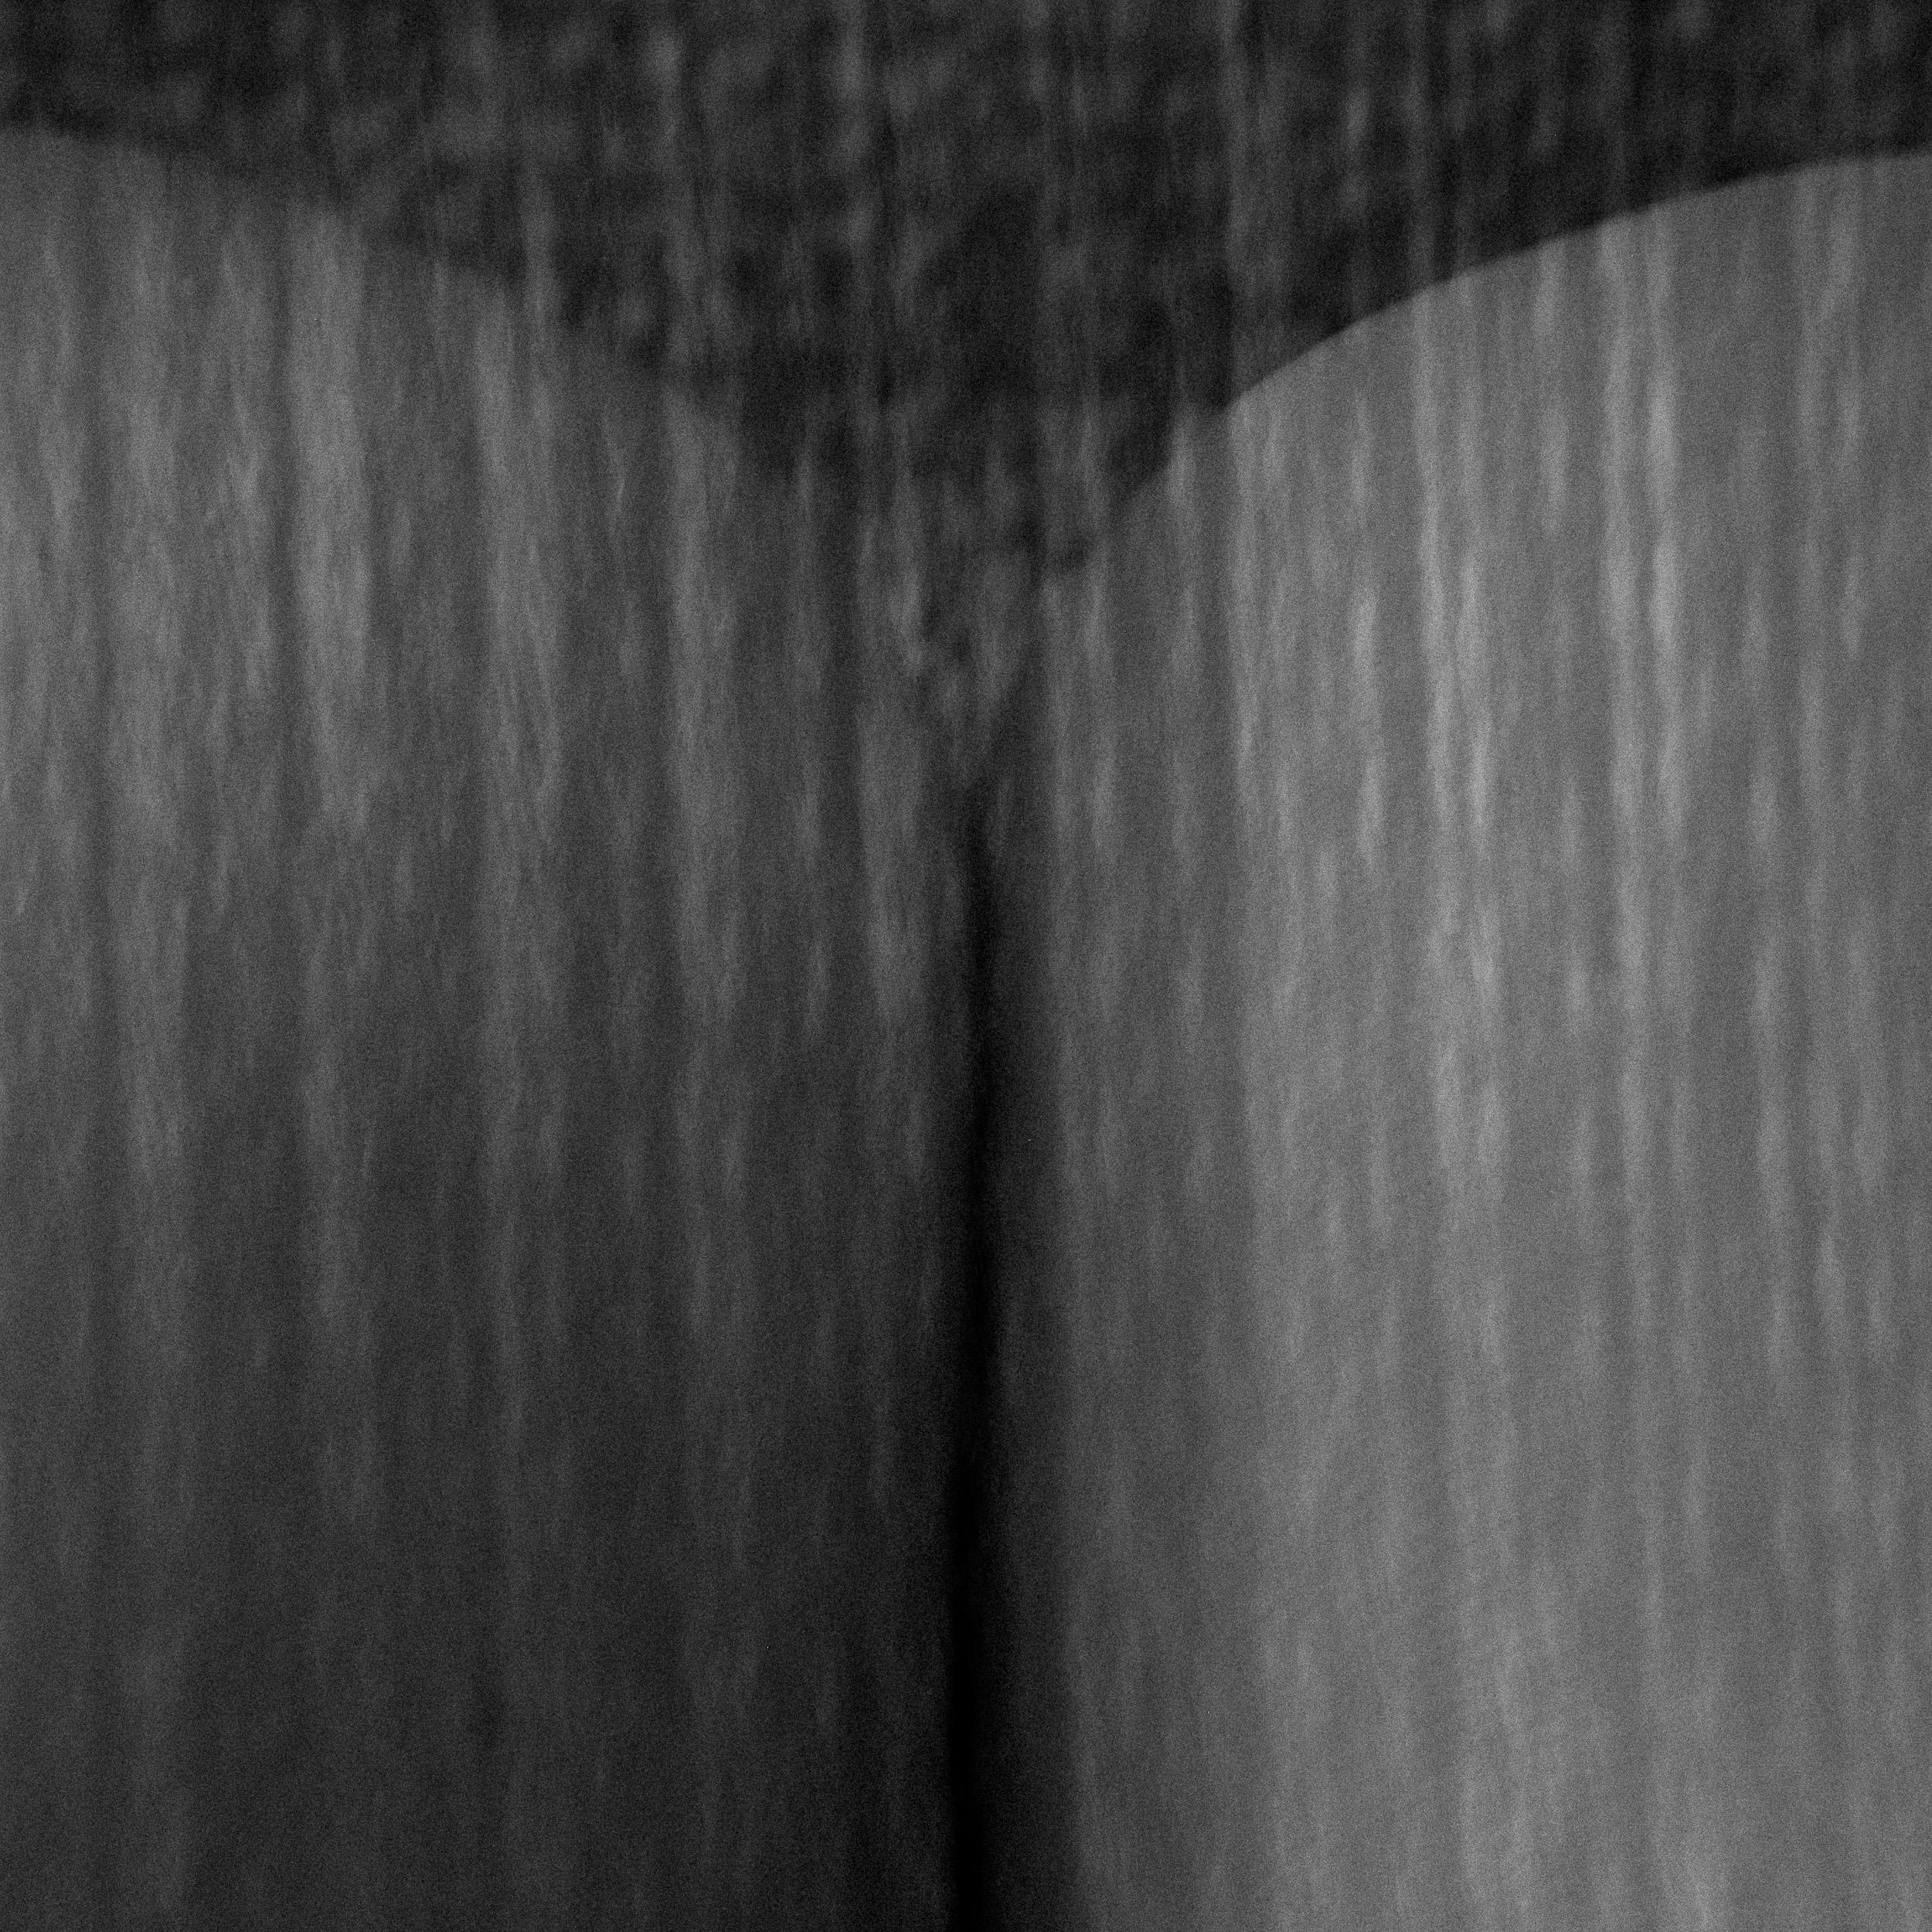 Frode_Olsen_Fine_art_photography_The_Rorschach_Exposures_14.jpg